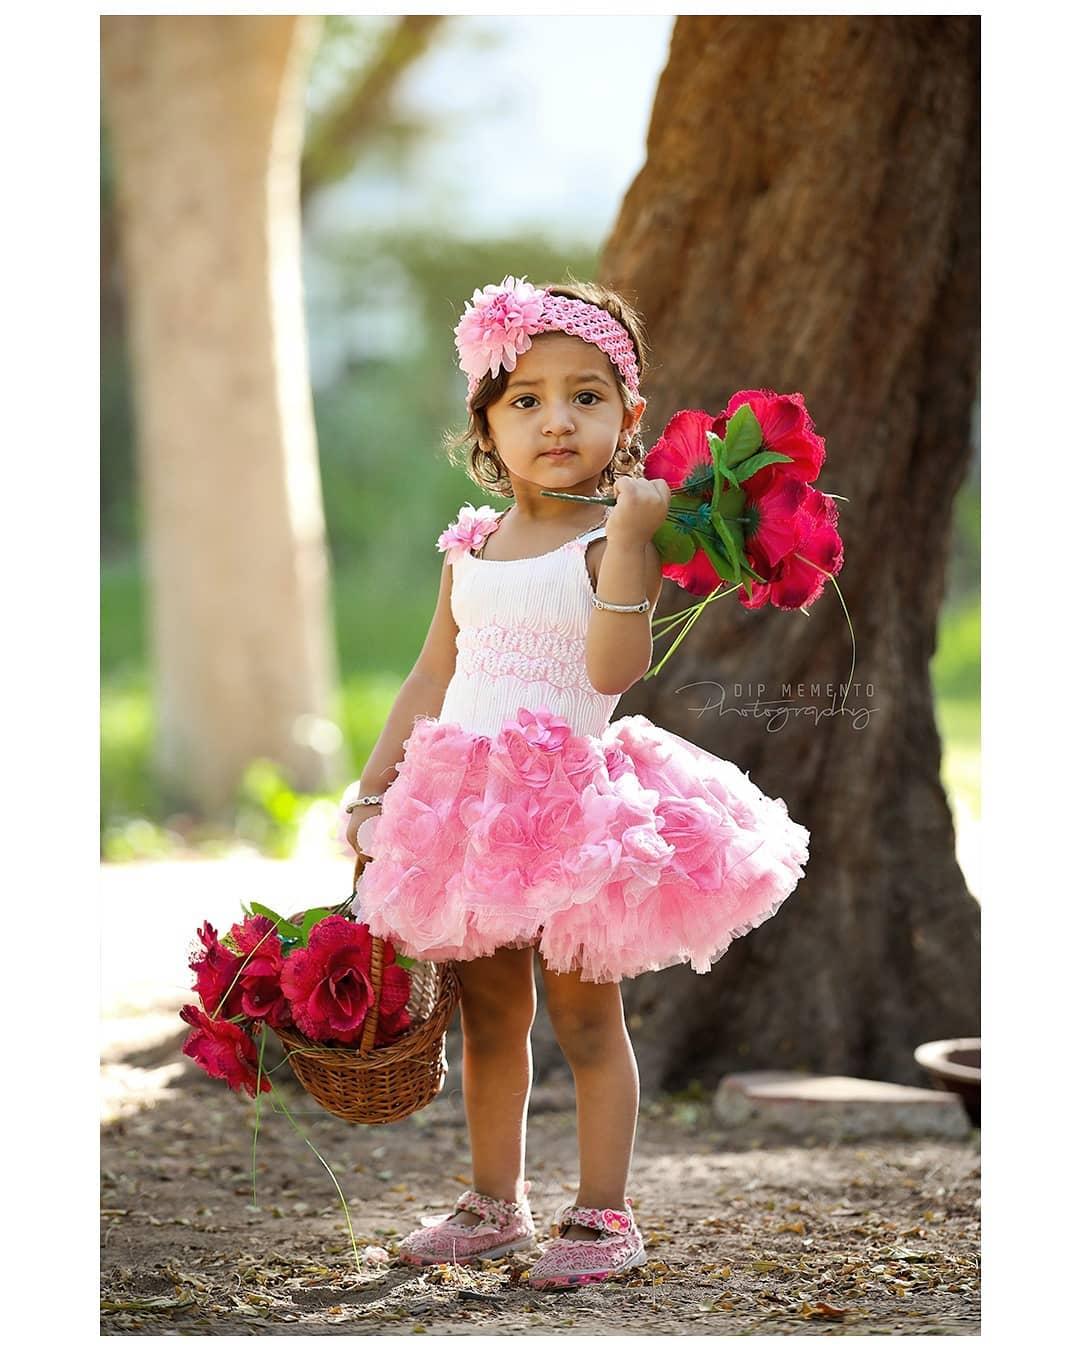 Hold on what is beautiful. 🌼💮🌸🌼💮🌸 😍 👶Kids shoot  #kidzfashion #kidsfashion #fashiongram #igkiddies #ootdkids_ig #kidsstylezz #fashionblogger #cutest_kiddies #kidz_ootd #fashionista #fashionkidsworld #thetrendykidz #kidsmodel #kidzootd #fashiongirl #kidsbabylove #9924227745 #fashionable #kidsphotography #fashionlovers #cutekid #fashionkidsworld #kids_fashion_blogger #ootd #kidswall #fashionminis #fashionblogger #fashionmagazine #dipmementophotography #fashionaddict #Ahmedabad #cutekidsclub